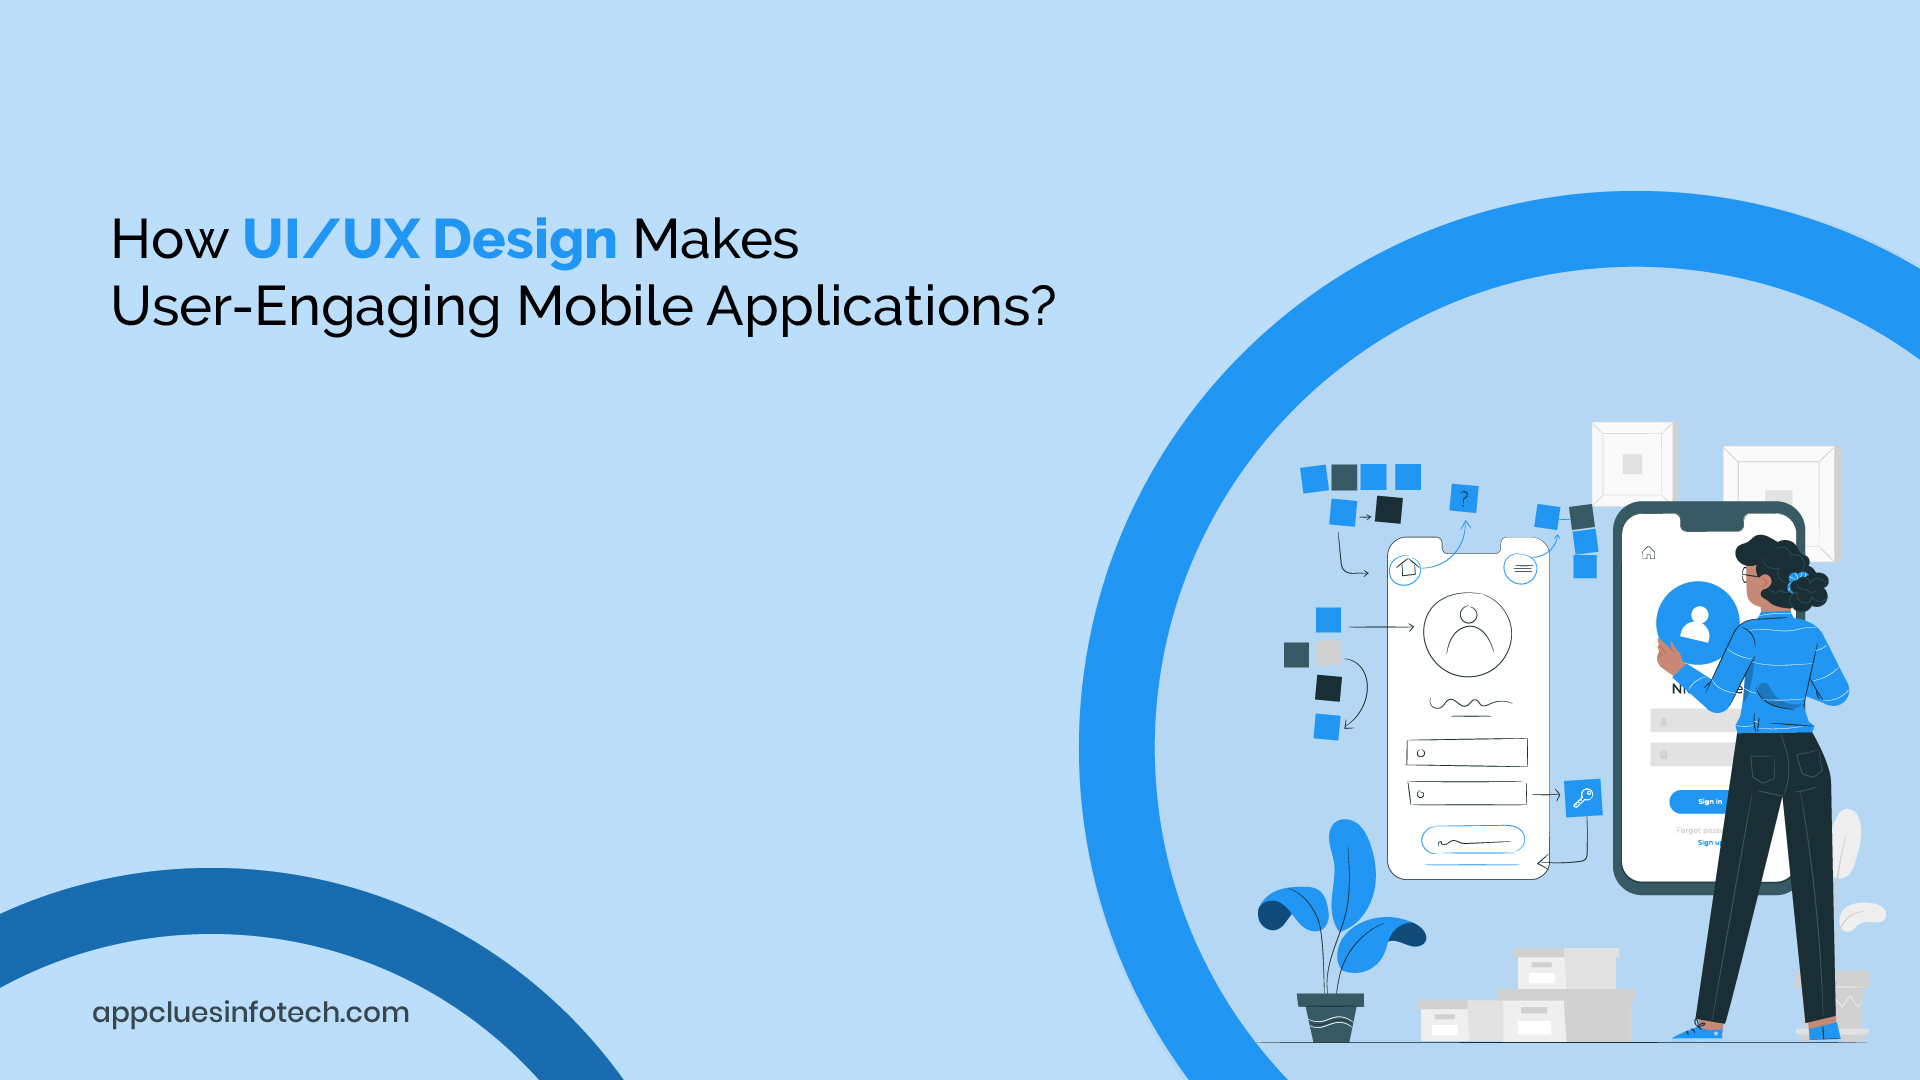 Best UI/UX Design Services Agency New York